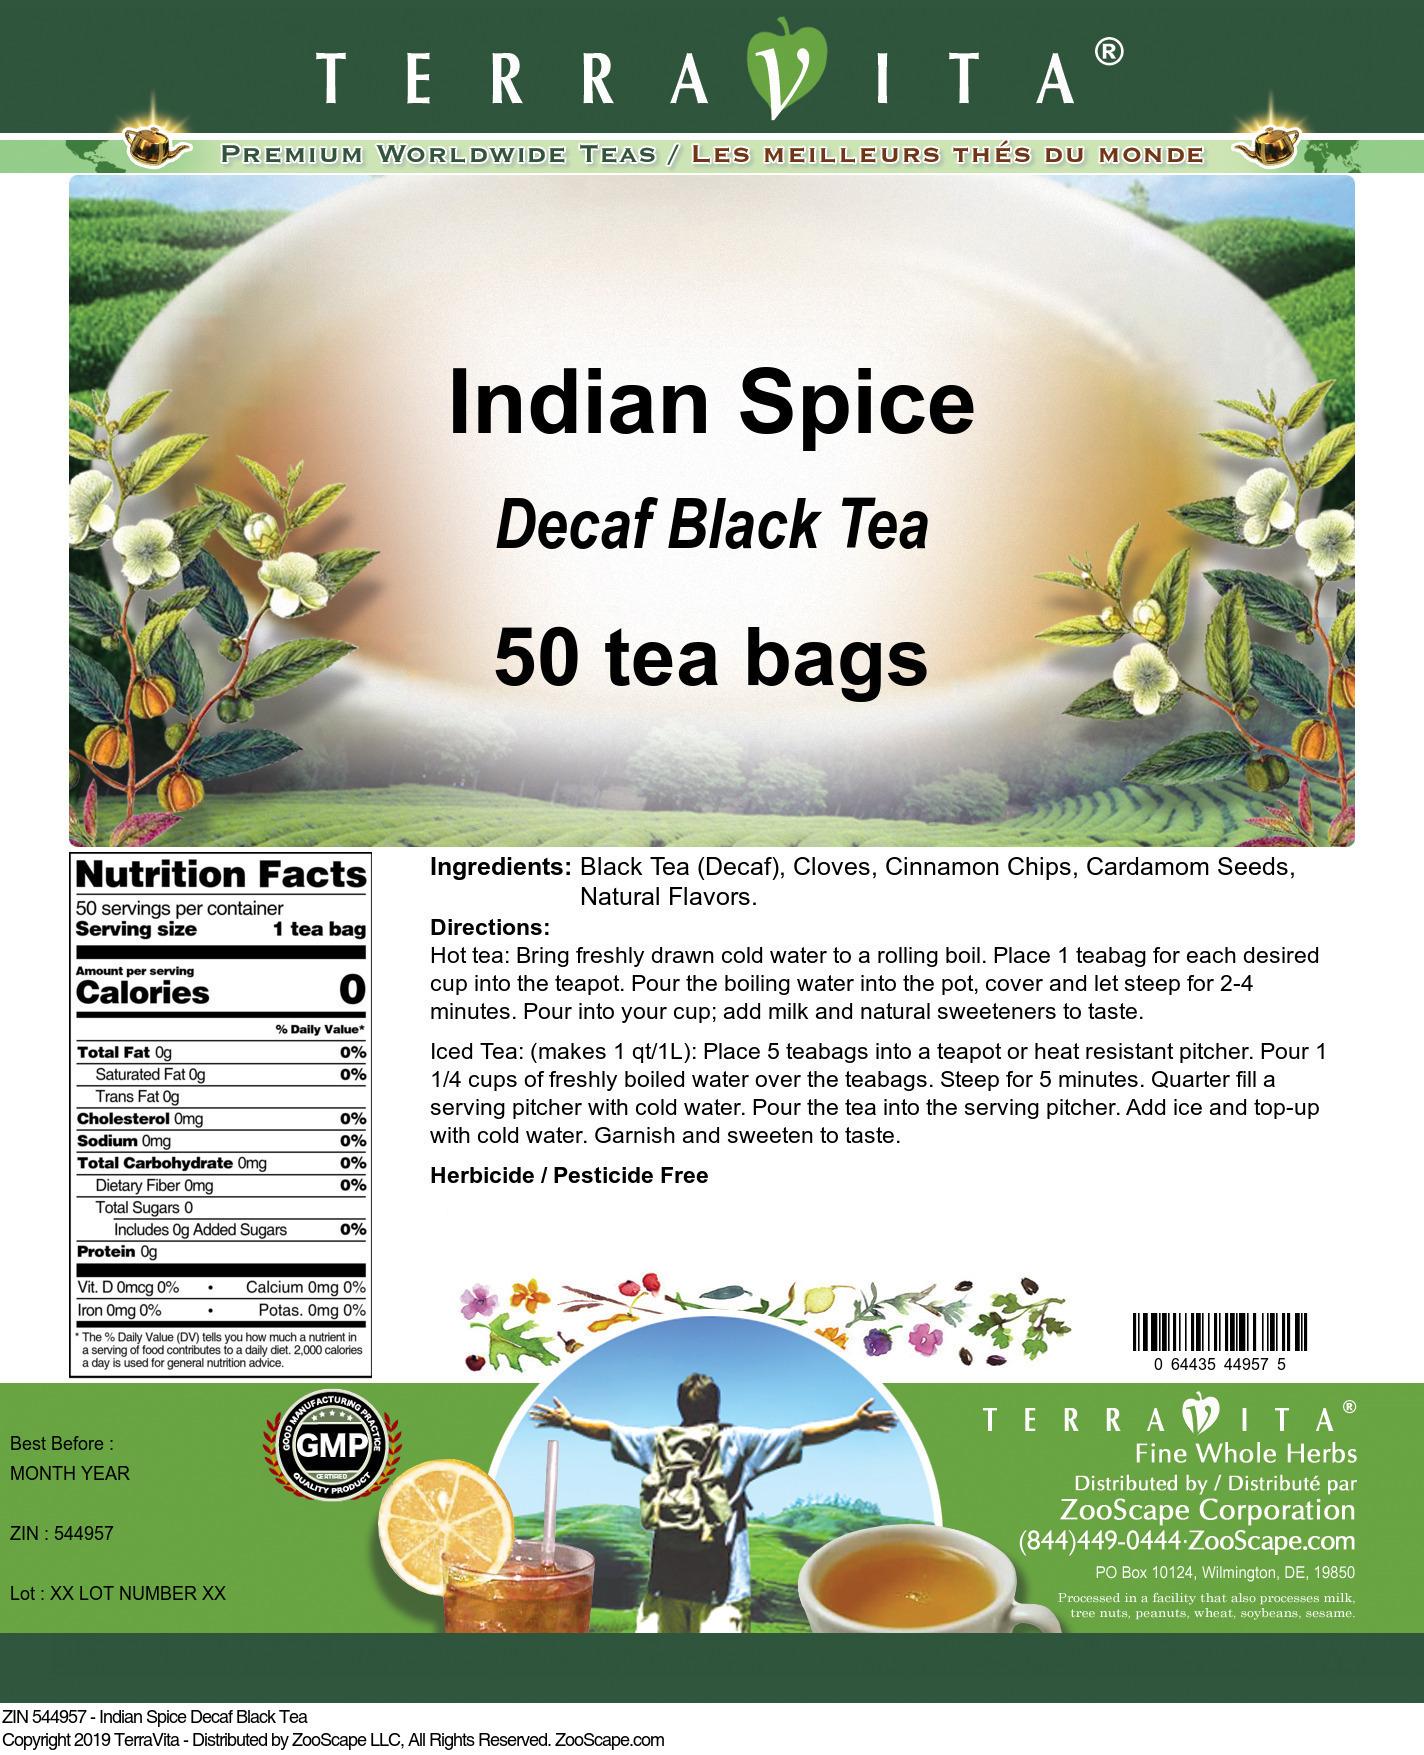 Indian Spice Decaf Black Tea